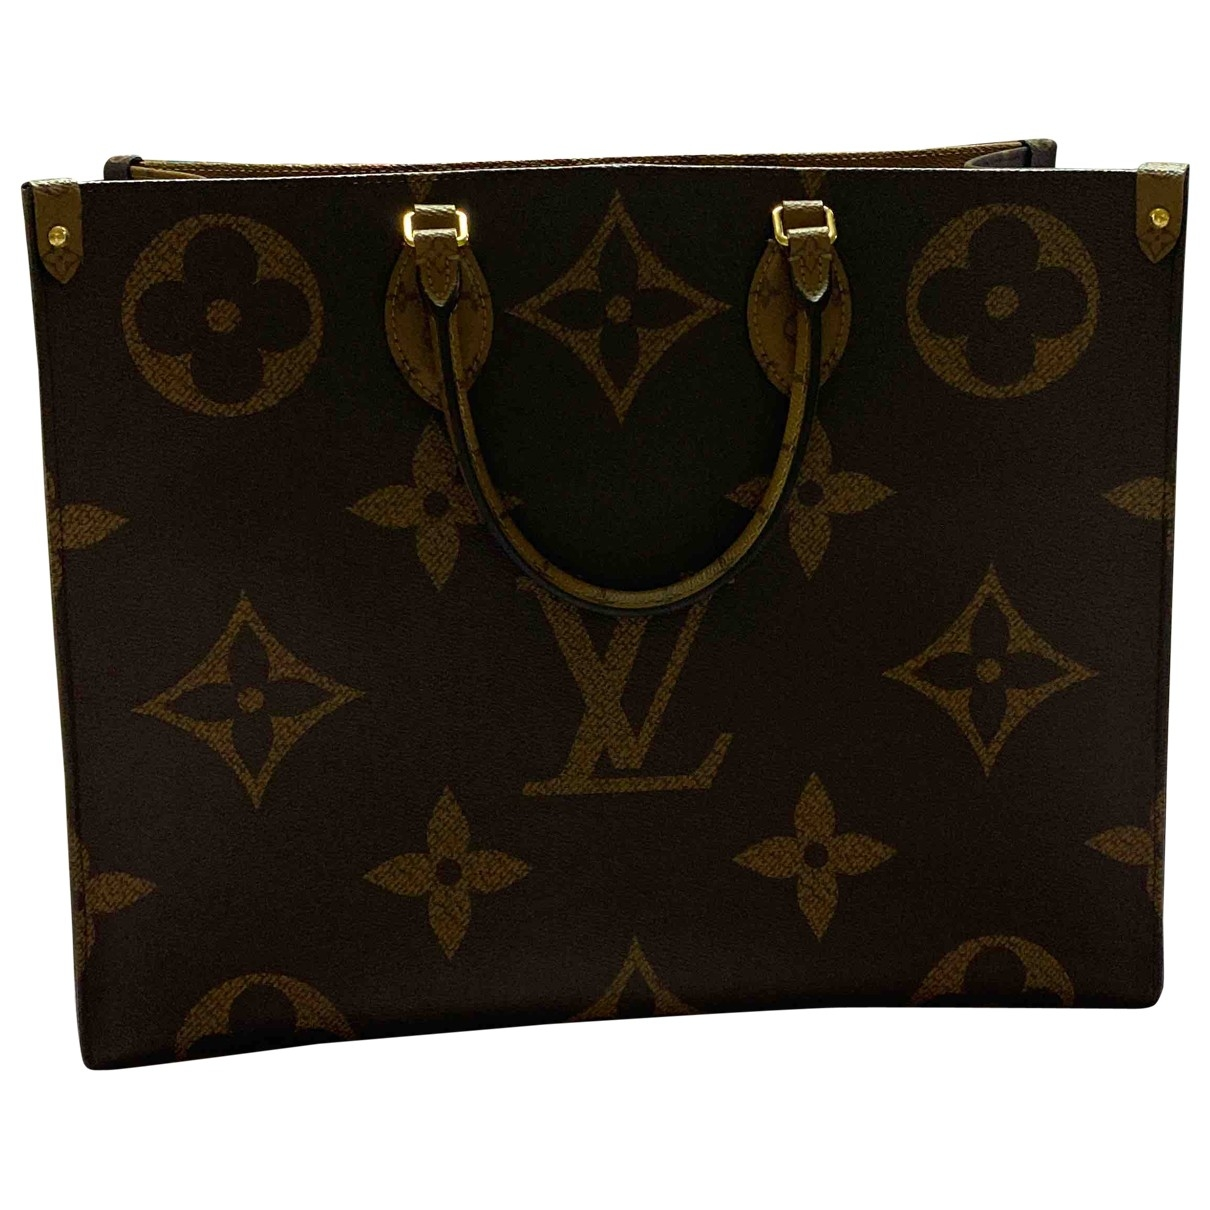 Louis Vuitton Onthego Camel Cloth handbag for Women \N